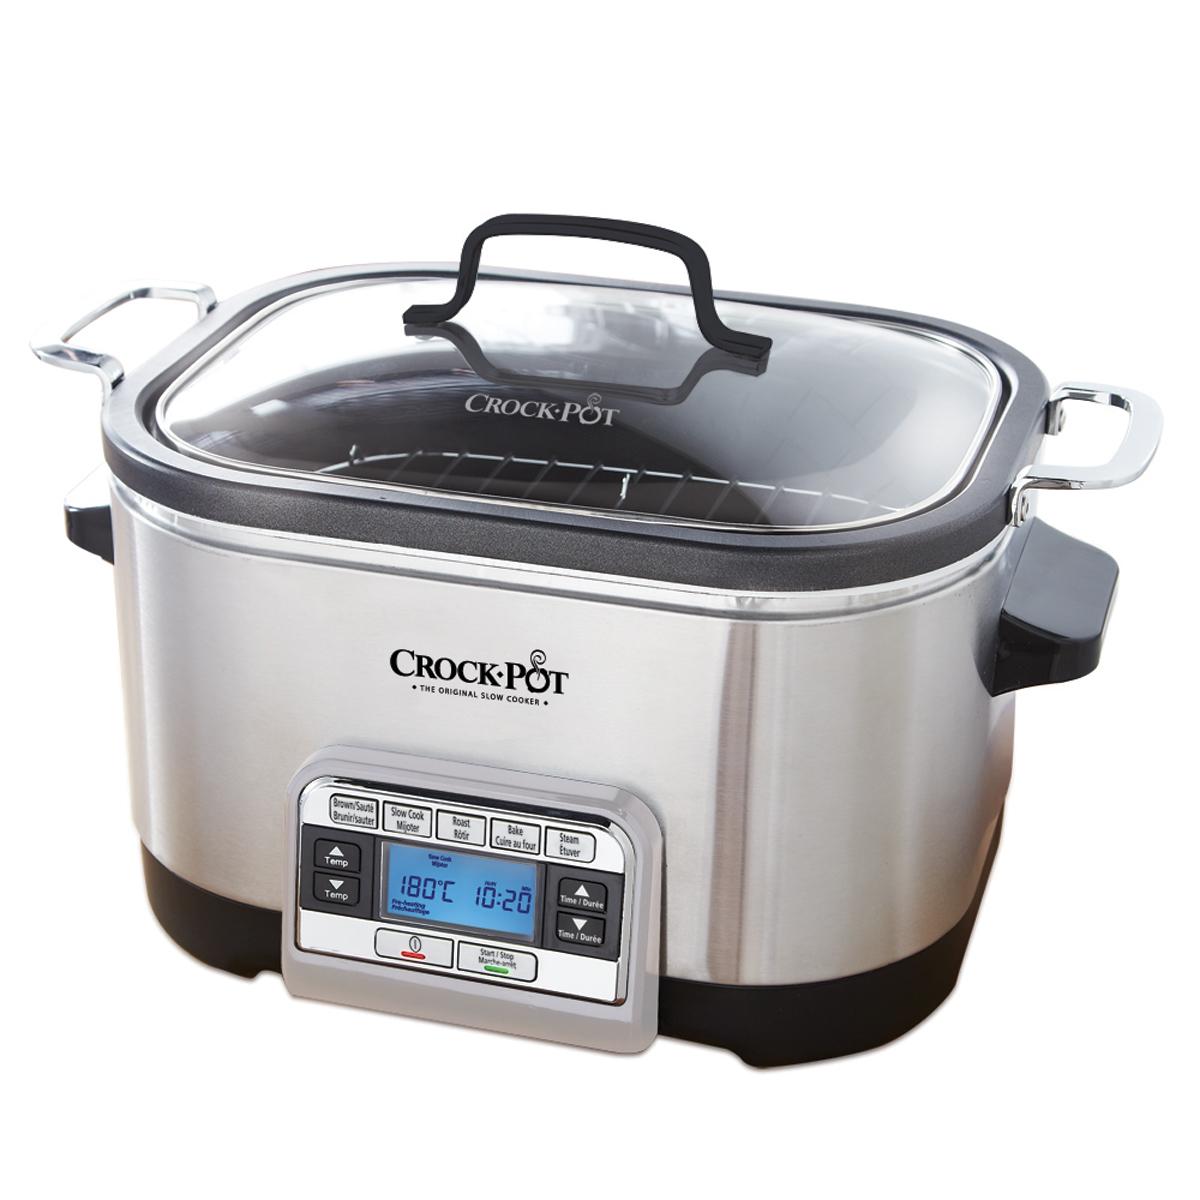 5 in 1 crock pot multi cooker crock pot canada for Multi cooker